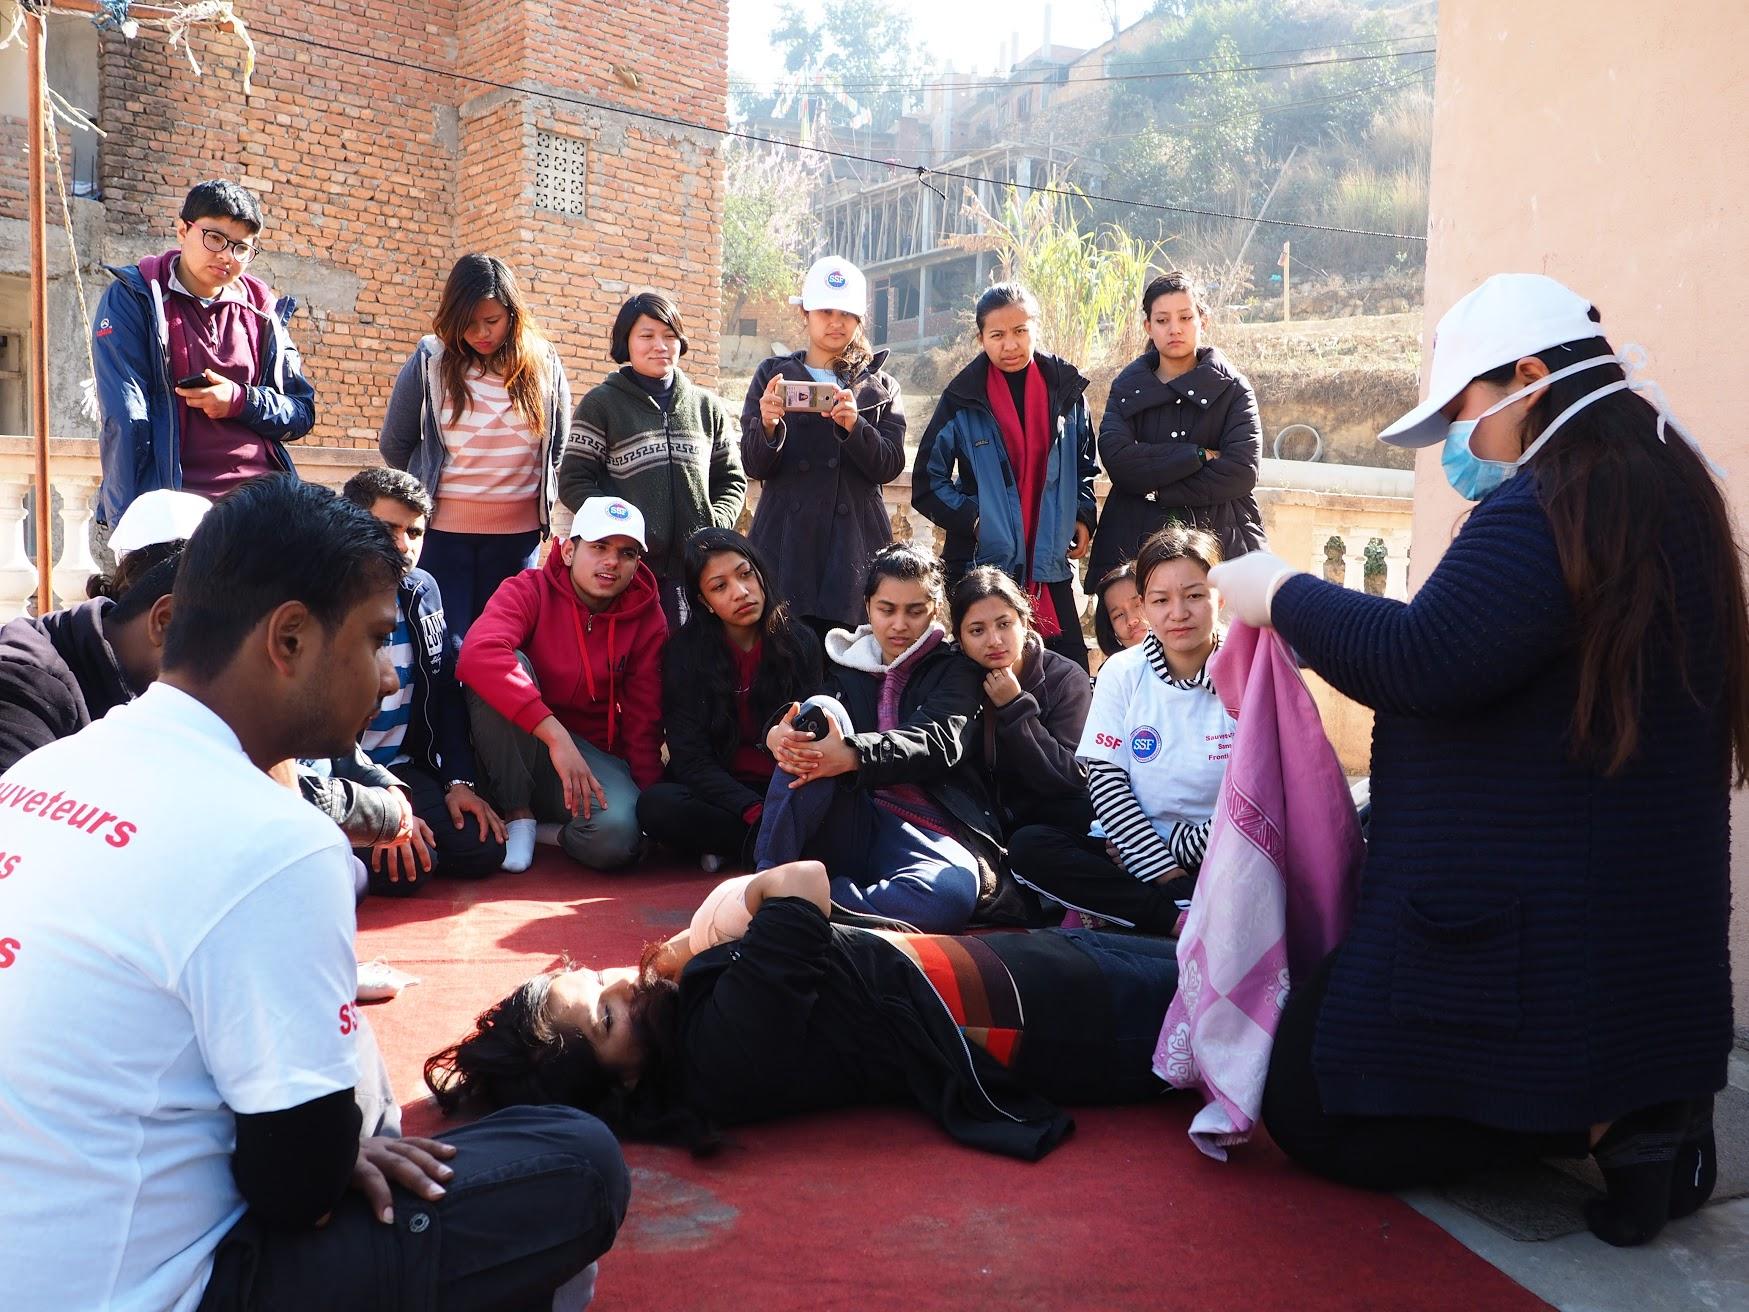 Stage de formation au secourisme, Aadeshowr, Népal, Fev 2018